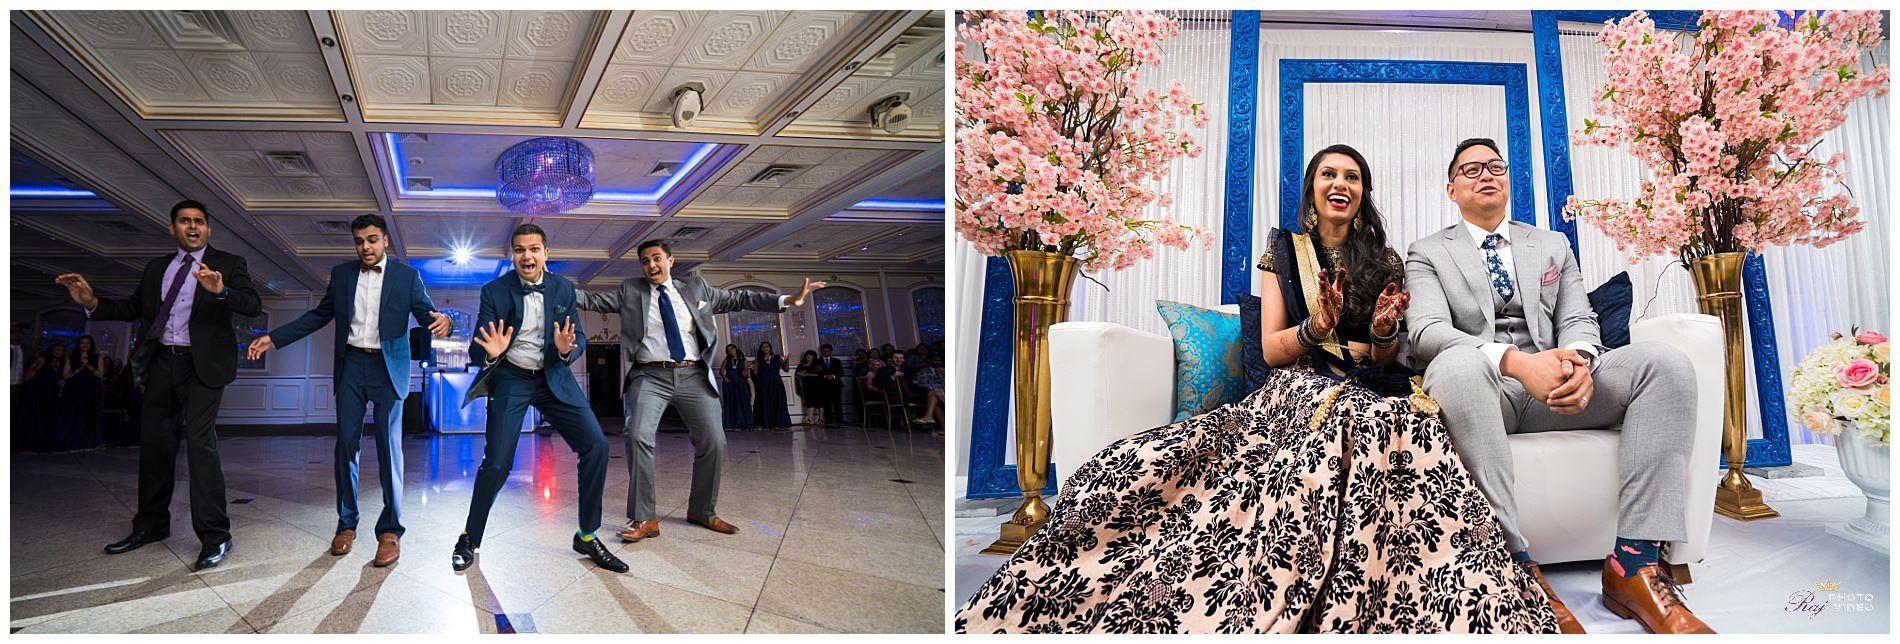 Royal-Manor-Garfield-NJ-Christian-Wedding-Ceremony-Khusbu-Jeff-70.jpg